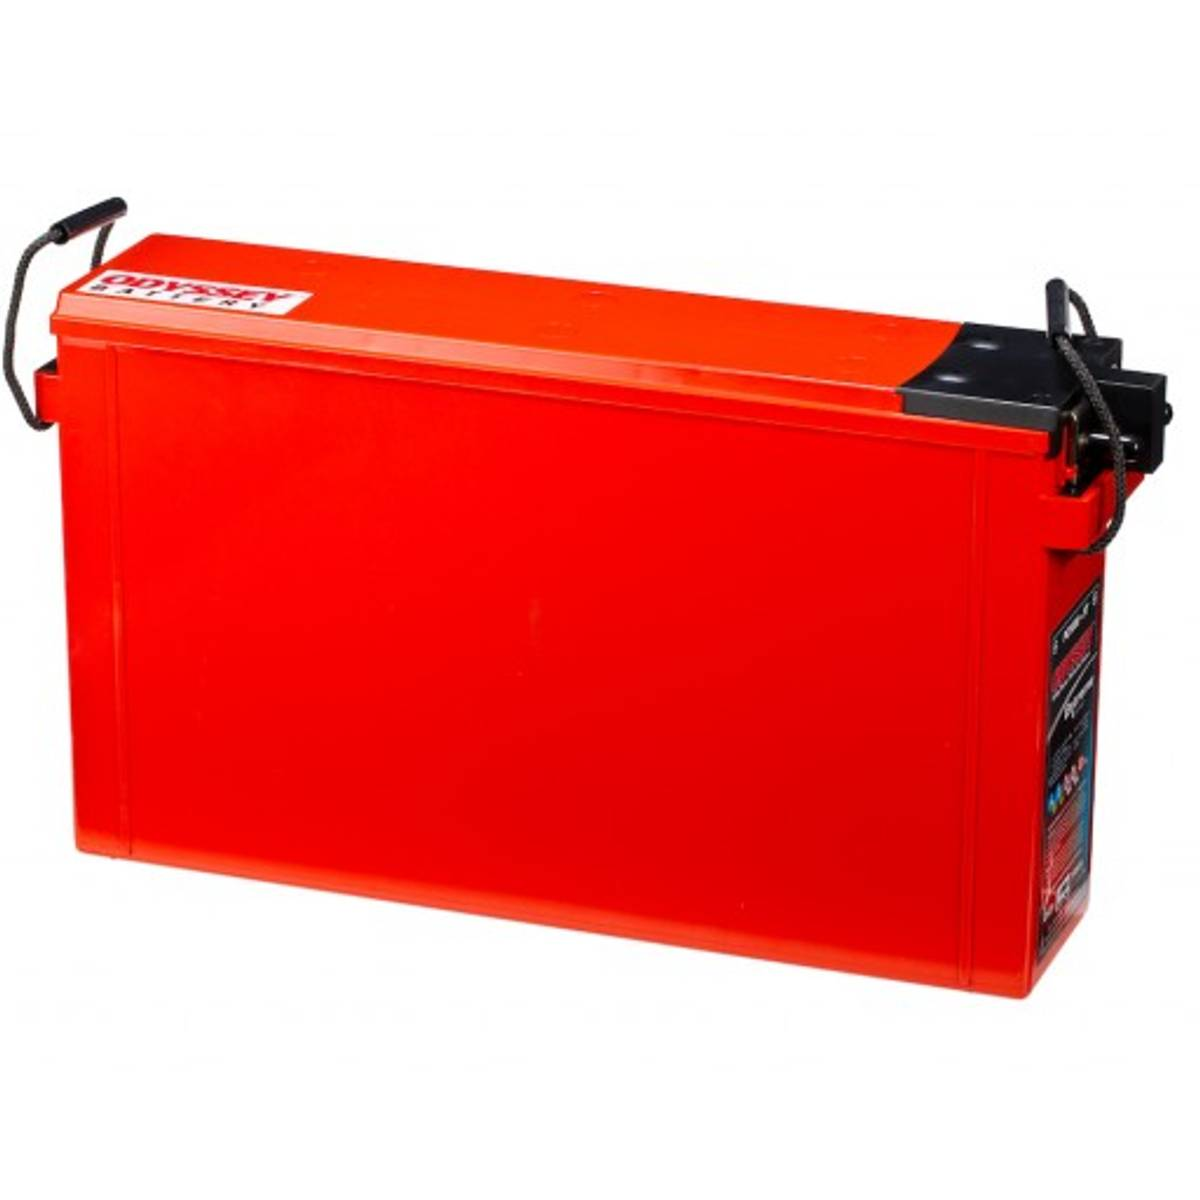 ODYSSEY PC1800-FT AGM Batteri 12V 214AH 1300CCA (581x125x316mm)